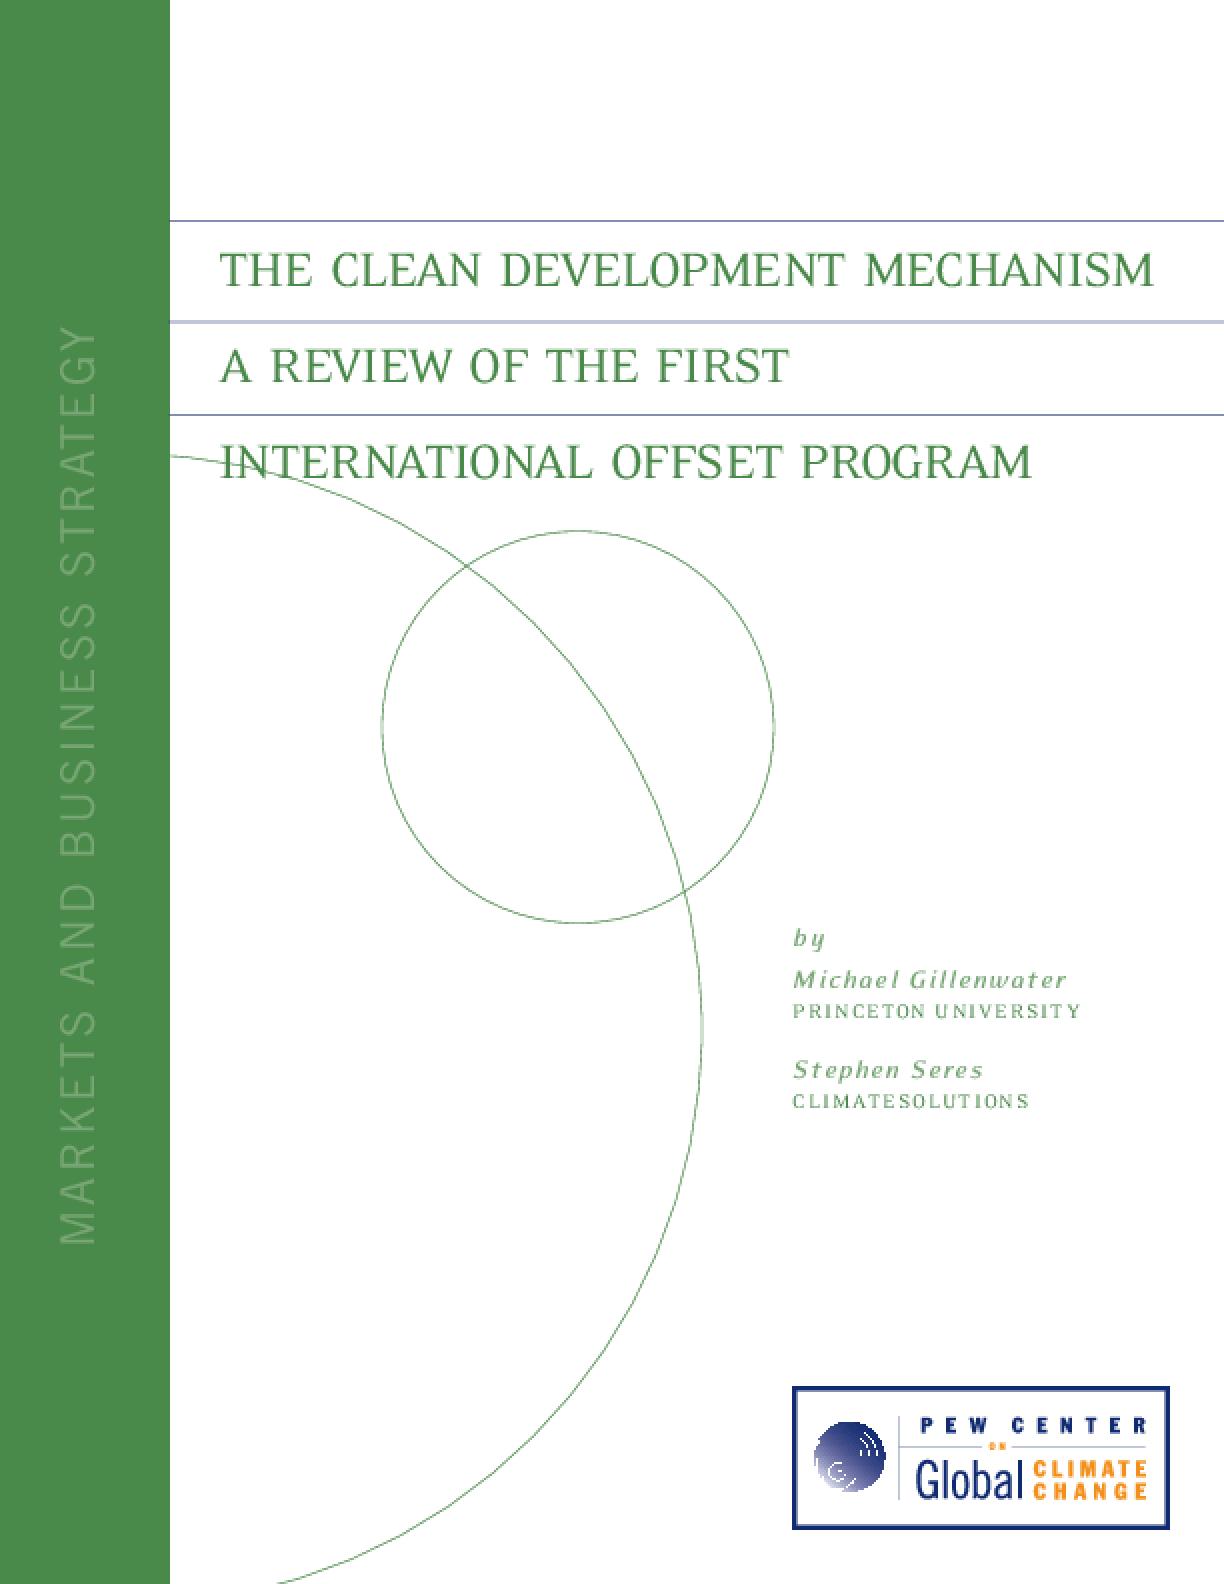 The Clean Development Mechanism: A Review of the First International Offset Program